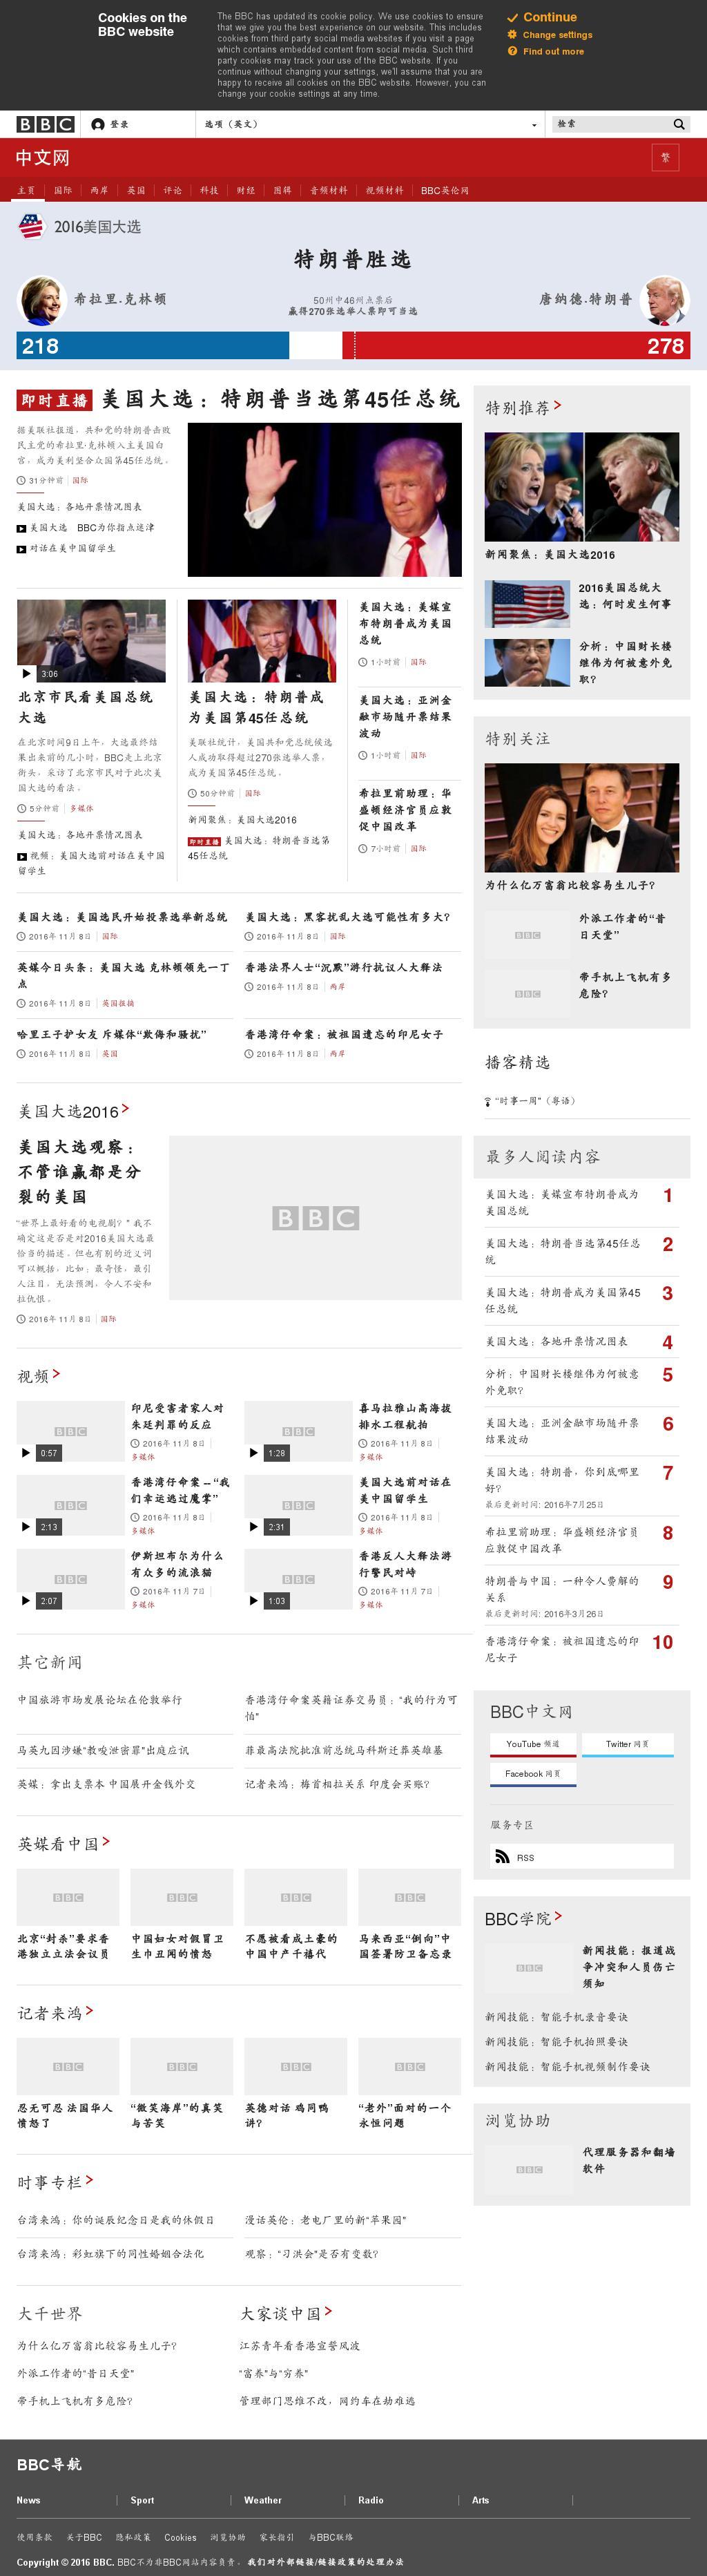 BBC (Chinese) at Wednesday Nov. 9, 2016, 9 a.m. UTC